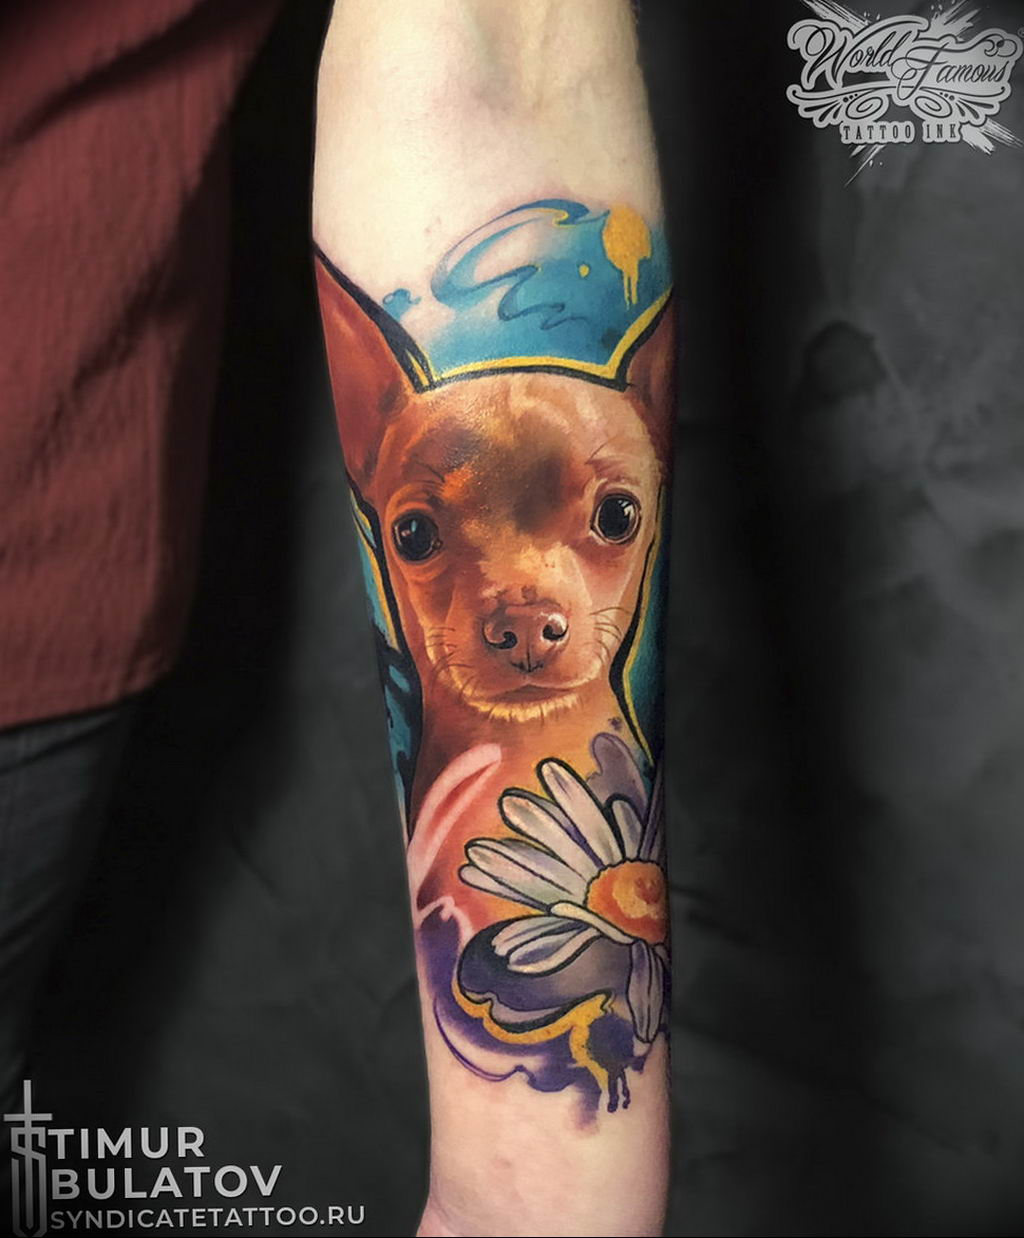 Фото тату студии Синдикат 09.09.2019 №080 - Syndicate tattoo - tatufoto.com